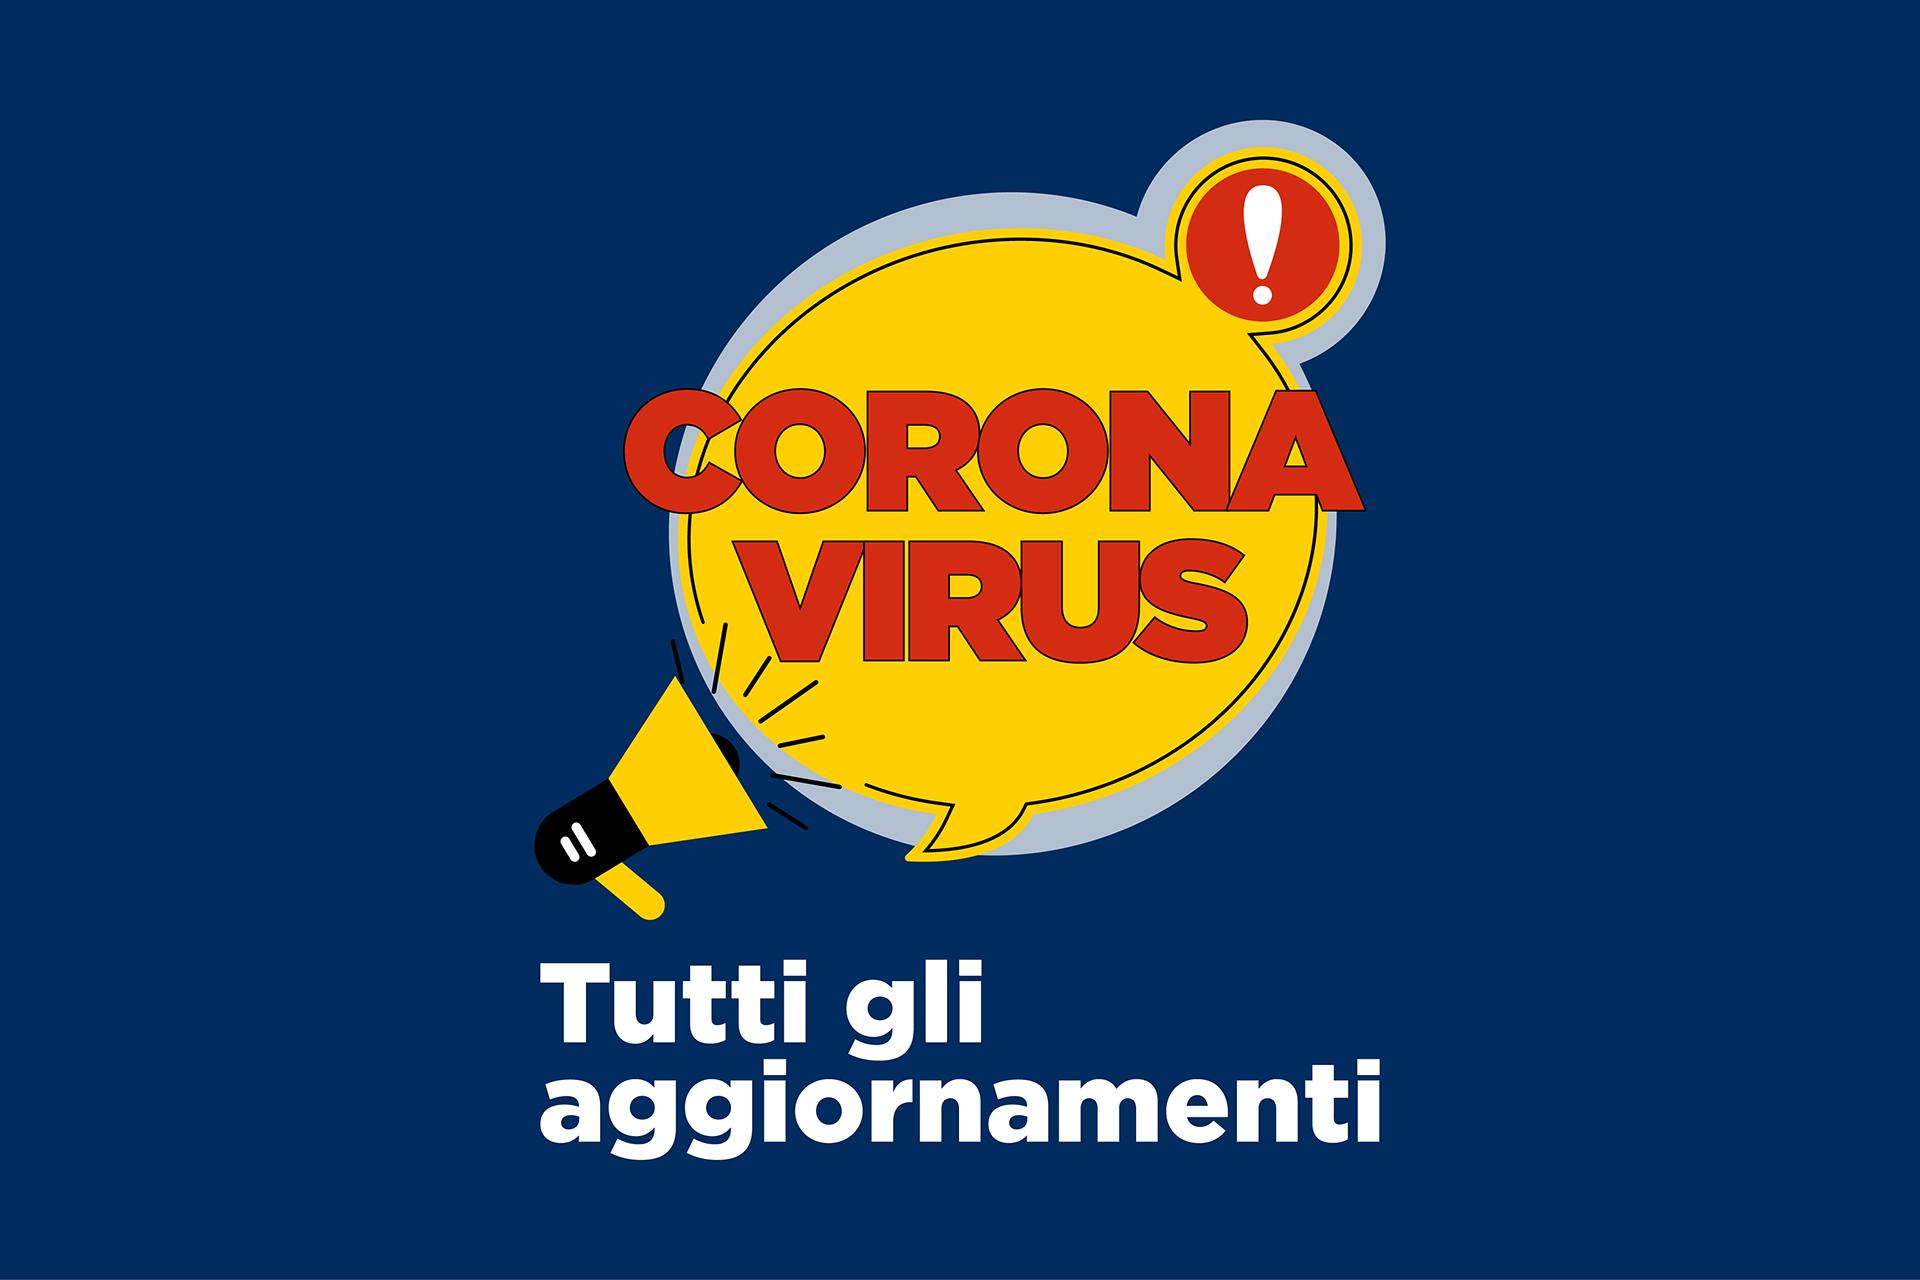 Emergenza Coronavirus Cna Modena